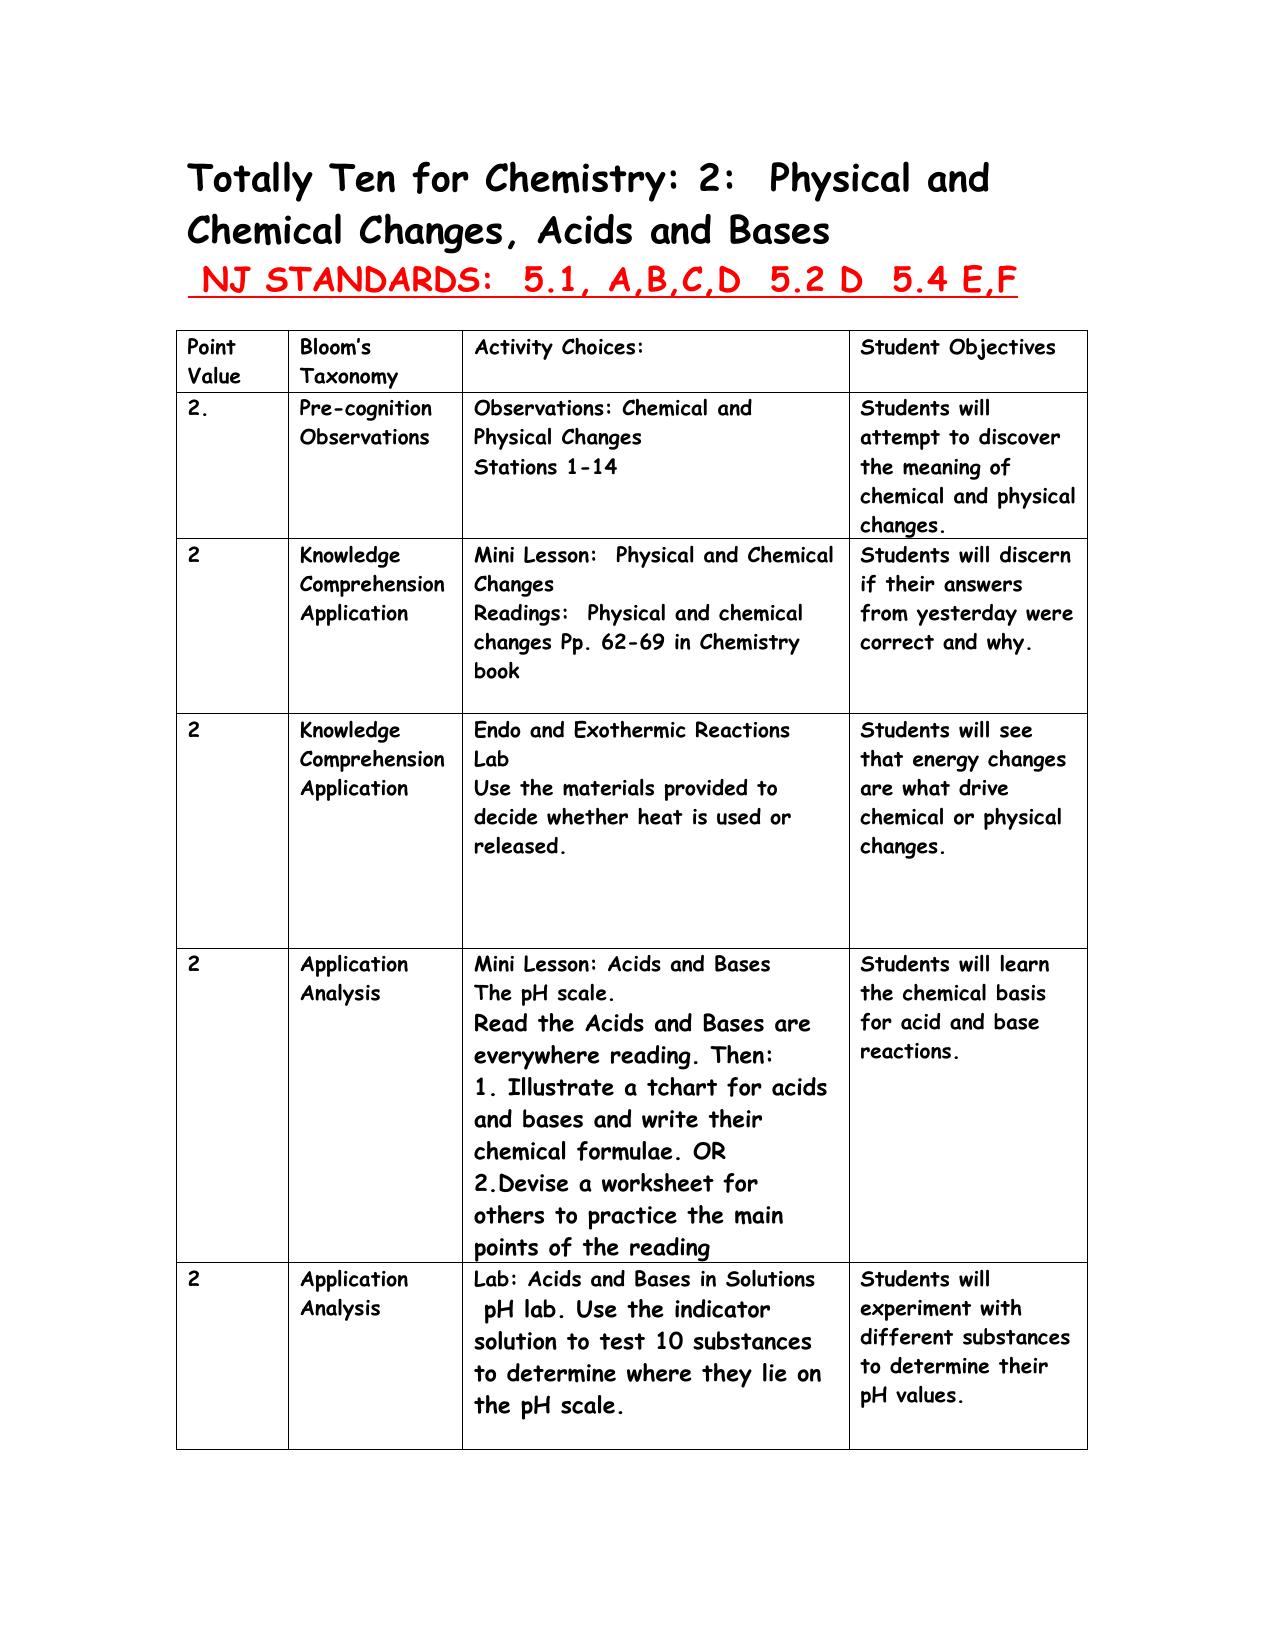 Totally ten for chemistry properties of matter ibookread Read Online